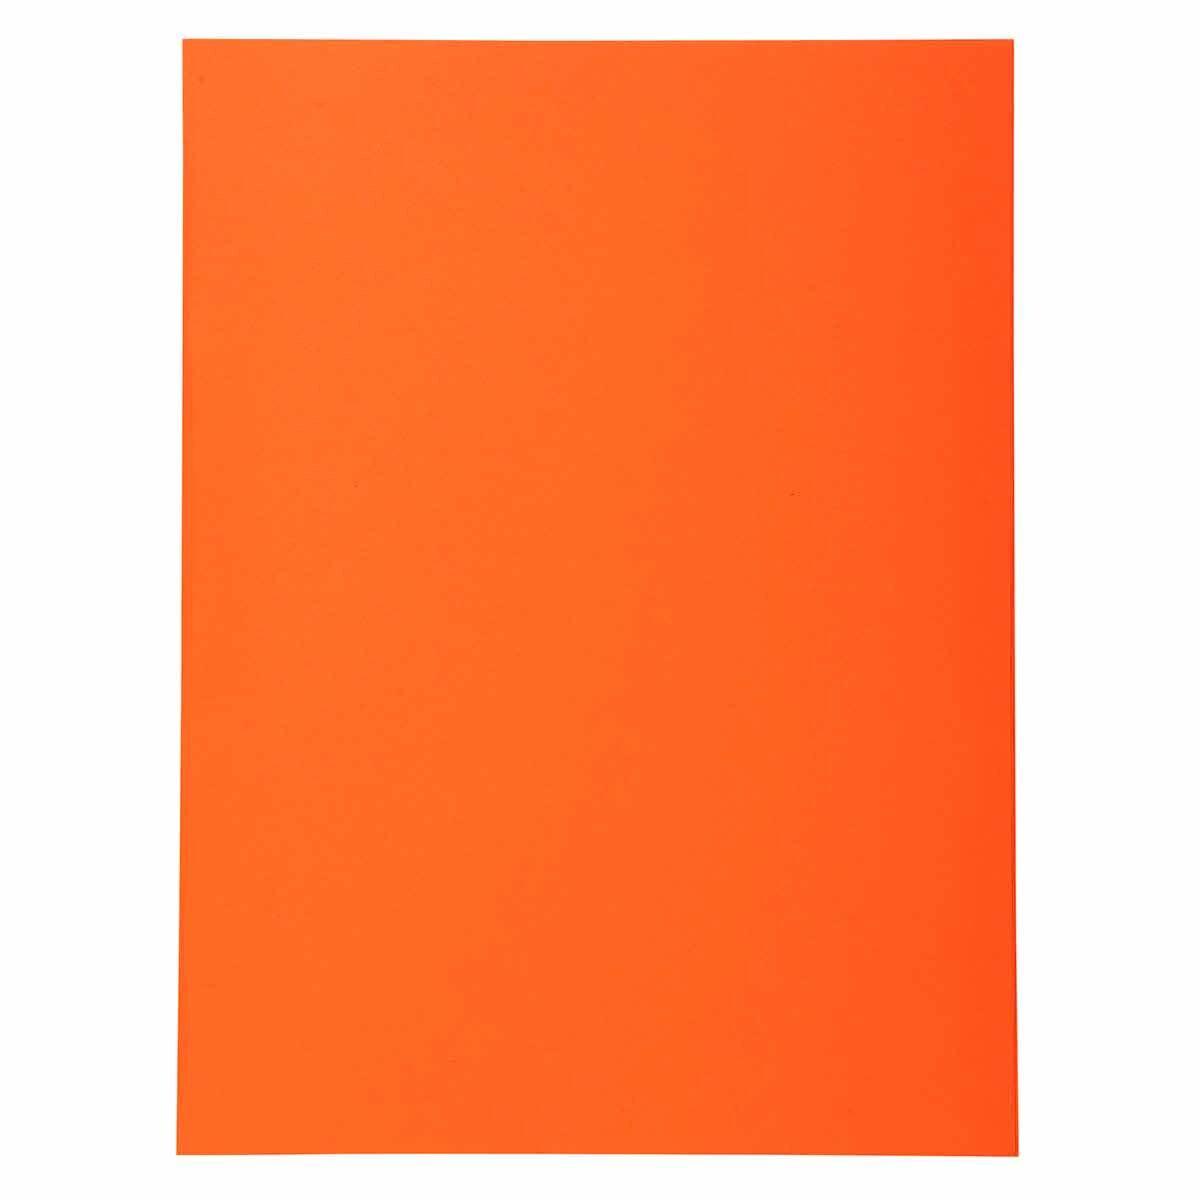 Exacompta Forever Square Cut Folders A4 170gsm 5 Packs of 100 Orange